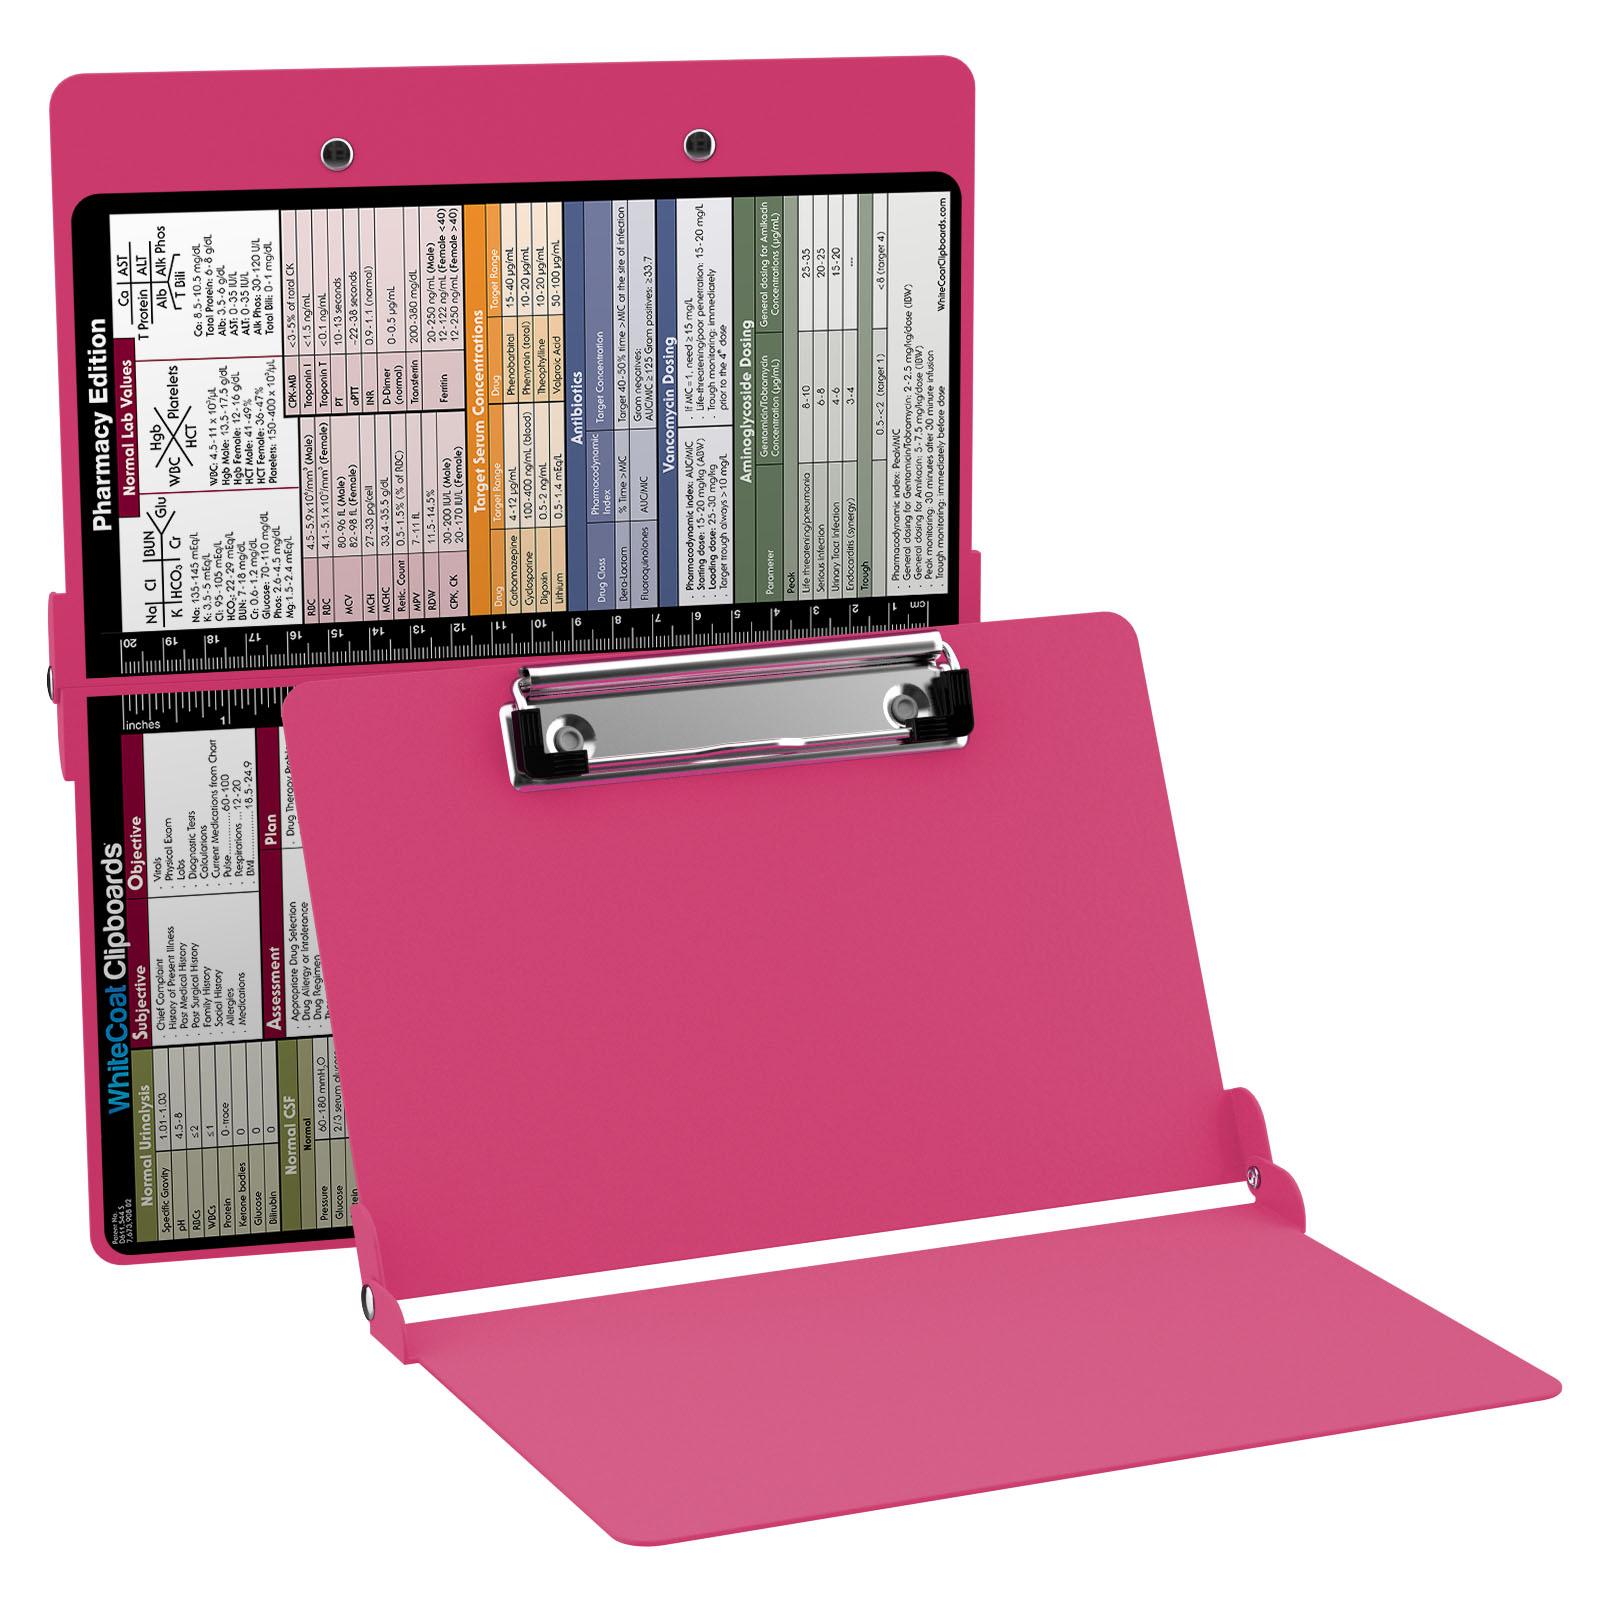 Whitecoat clipboard pink pharmacy edition